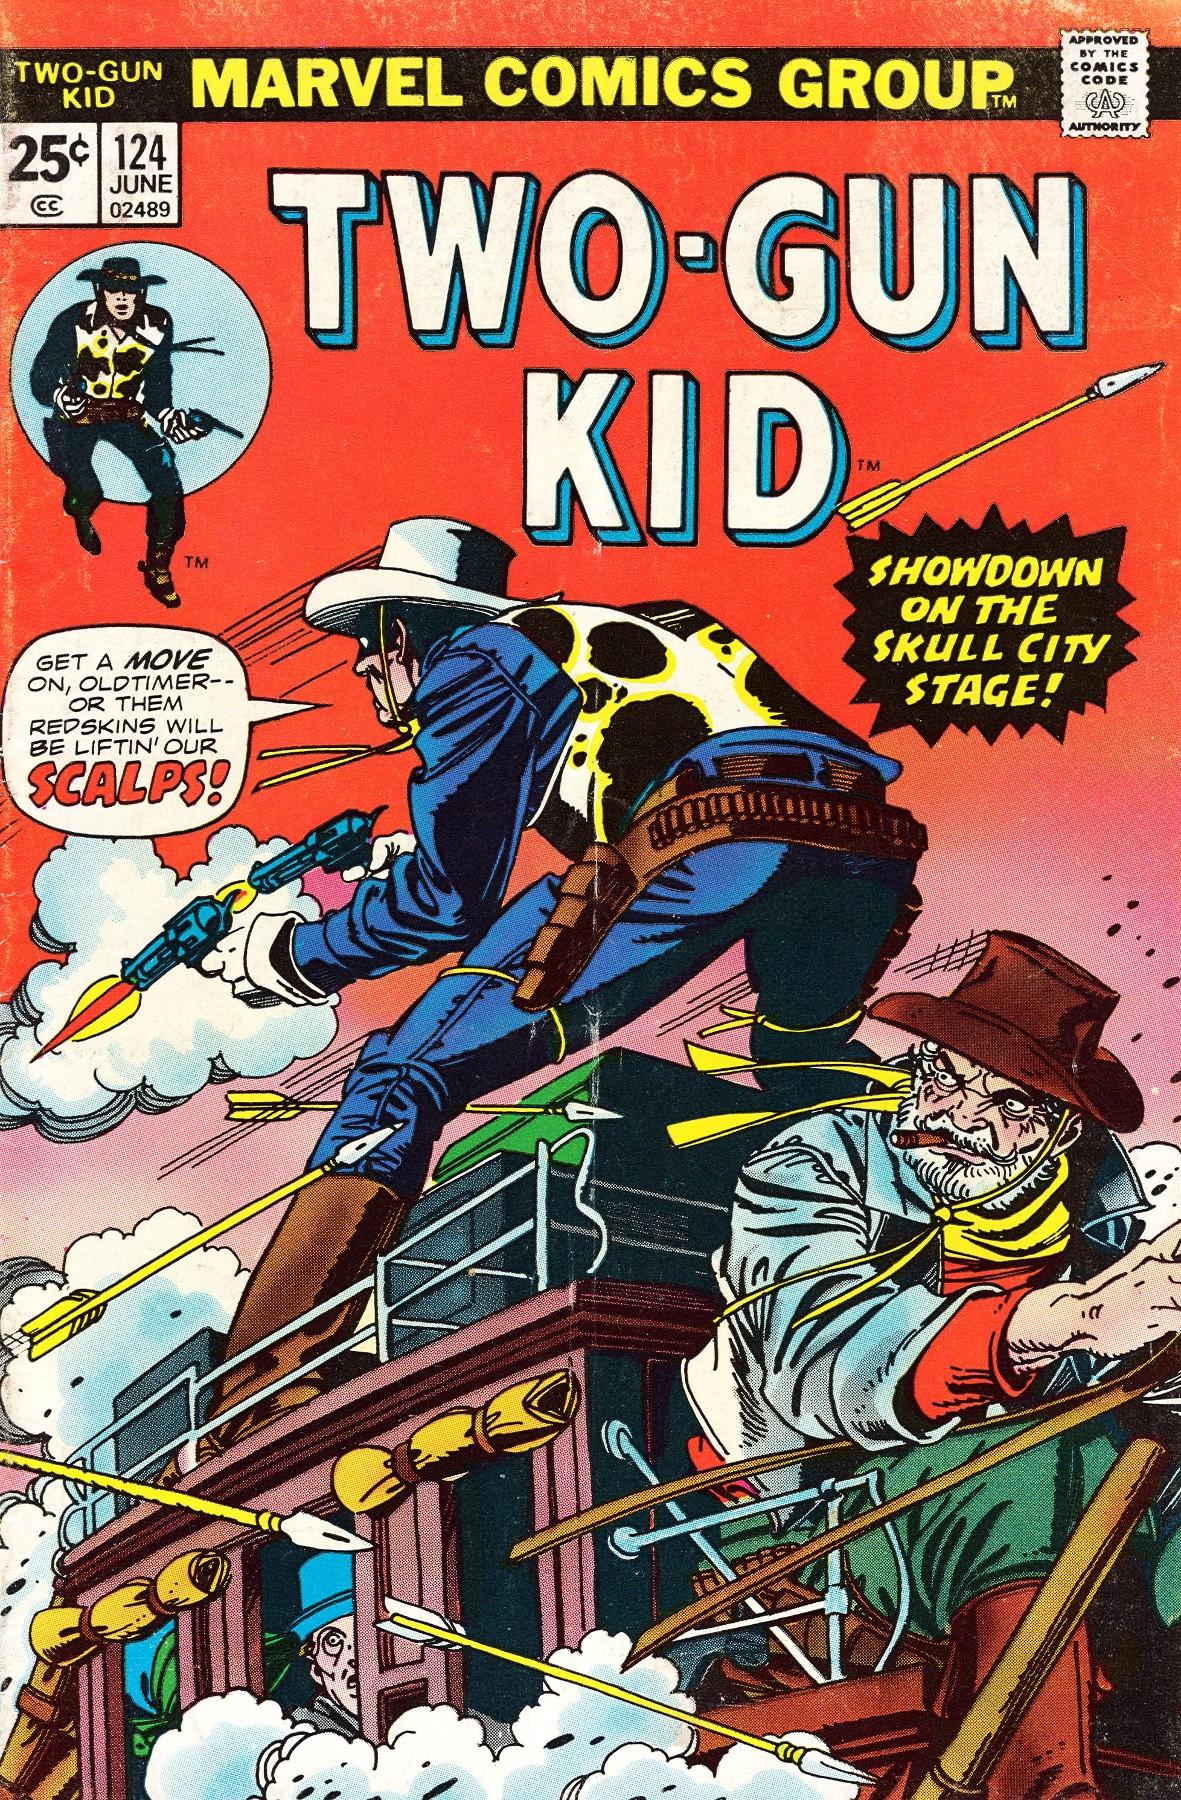 Read online Two-Gun Kid comic -  Issue #124 - 1